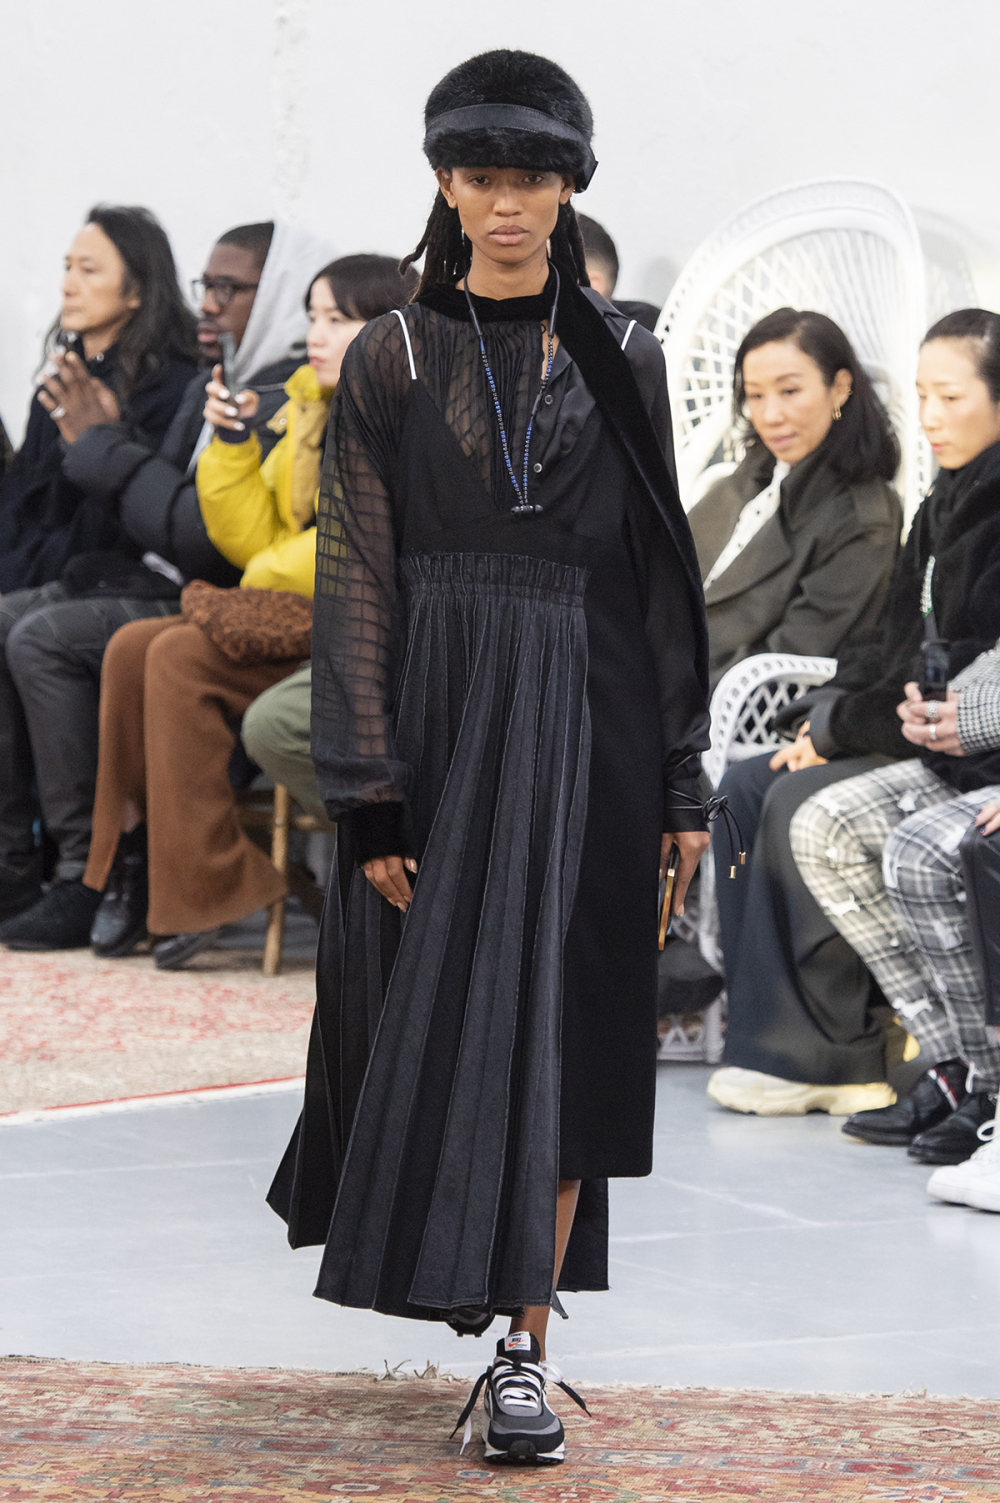 Sacai时装系列超大号黑色圆领毛衣和长款绿色北欧毛衣连衣裙-26.jpg